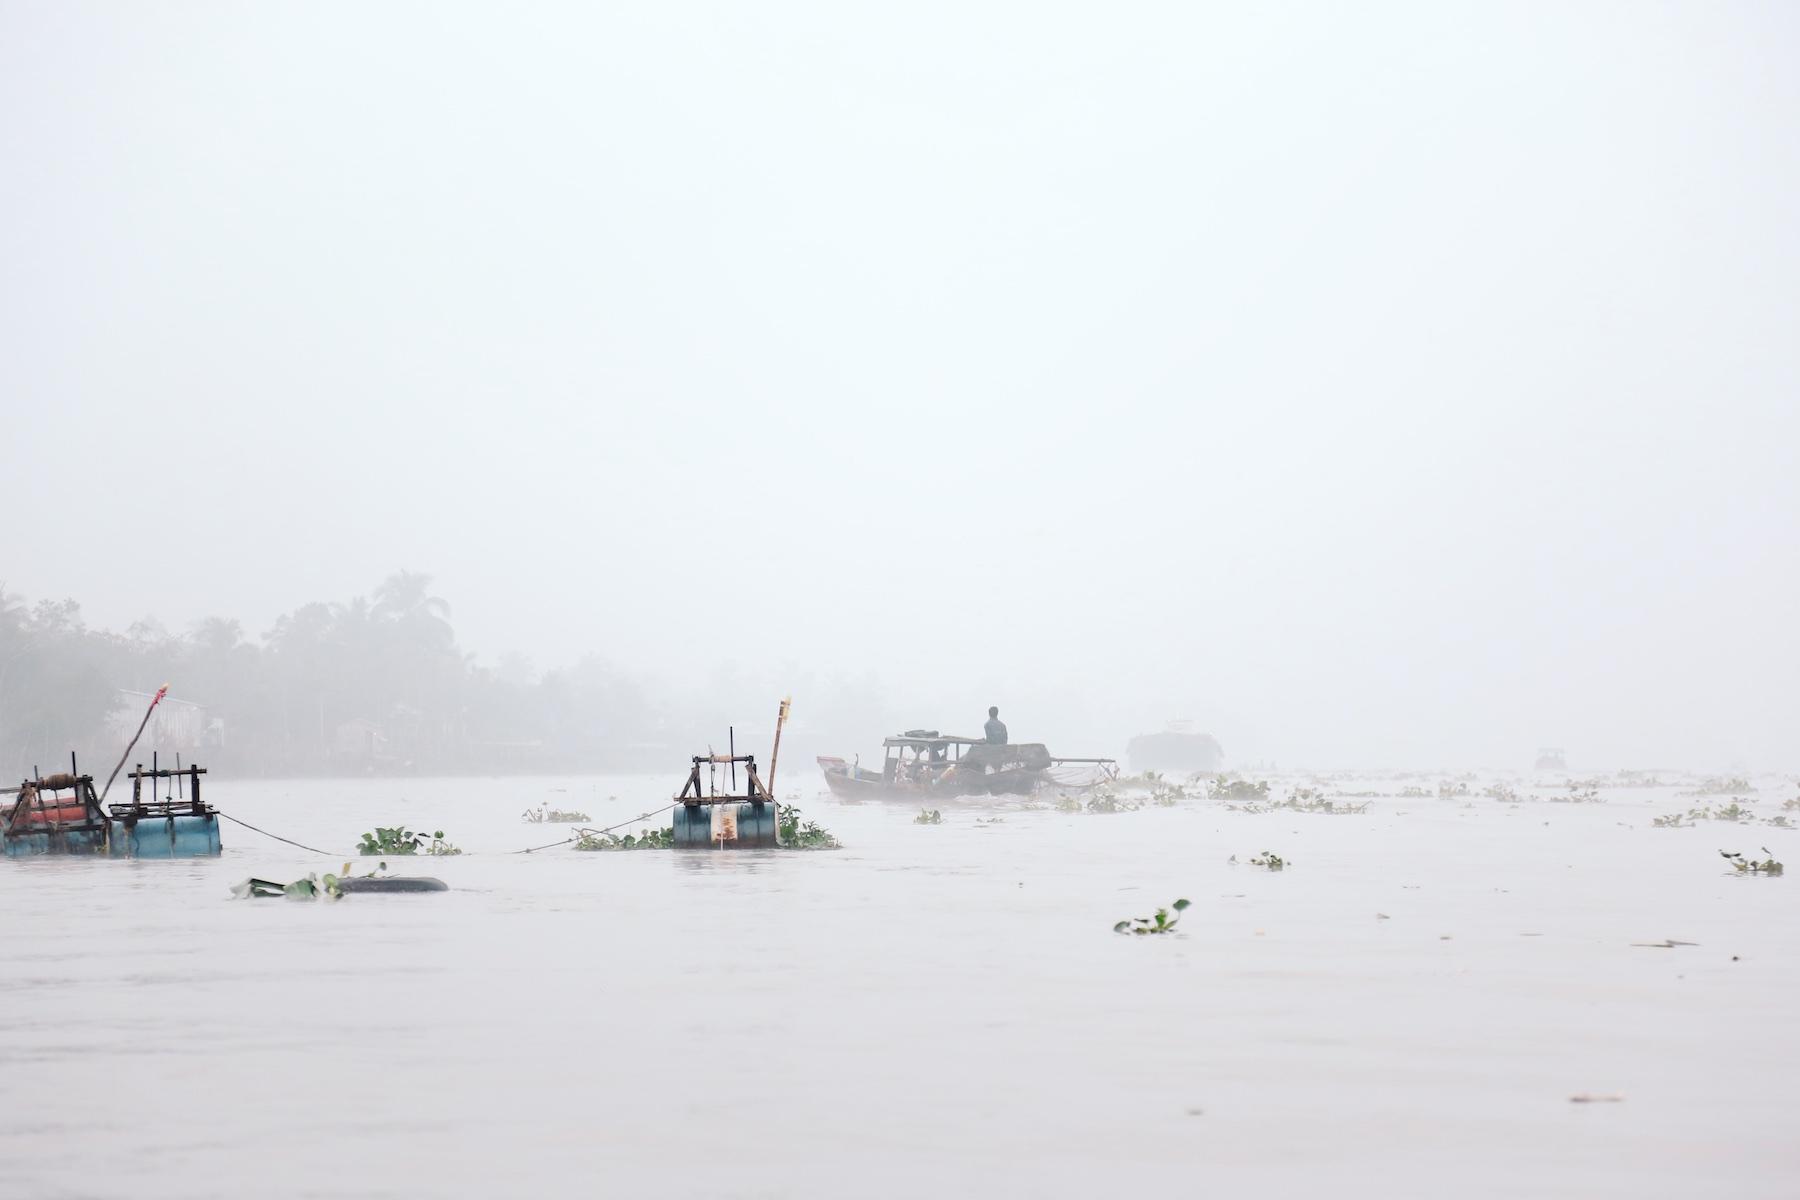 MEKONG DELTA VIETNAM © Manoah Biesheuvel 17